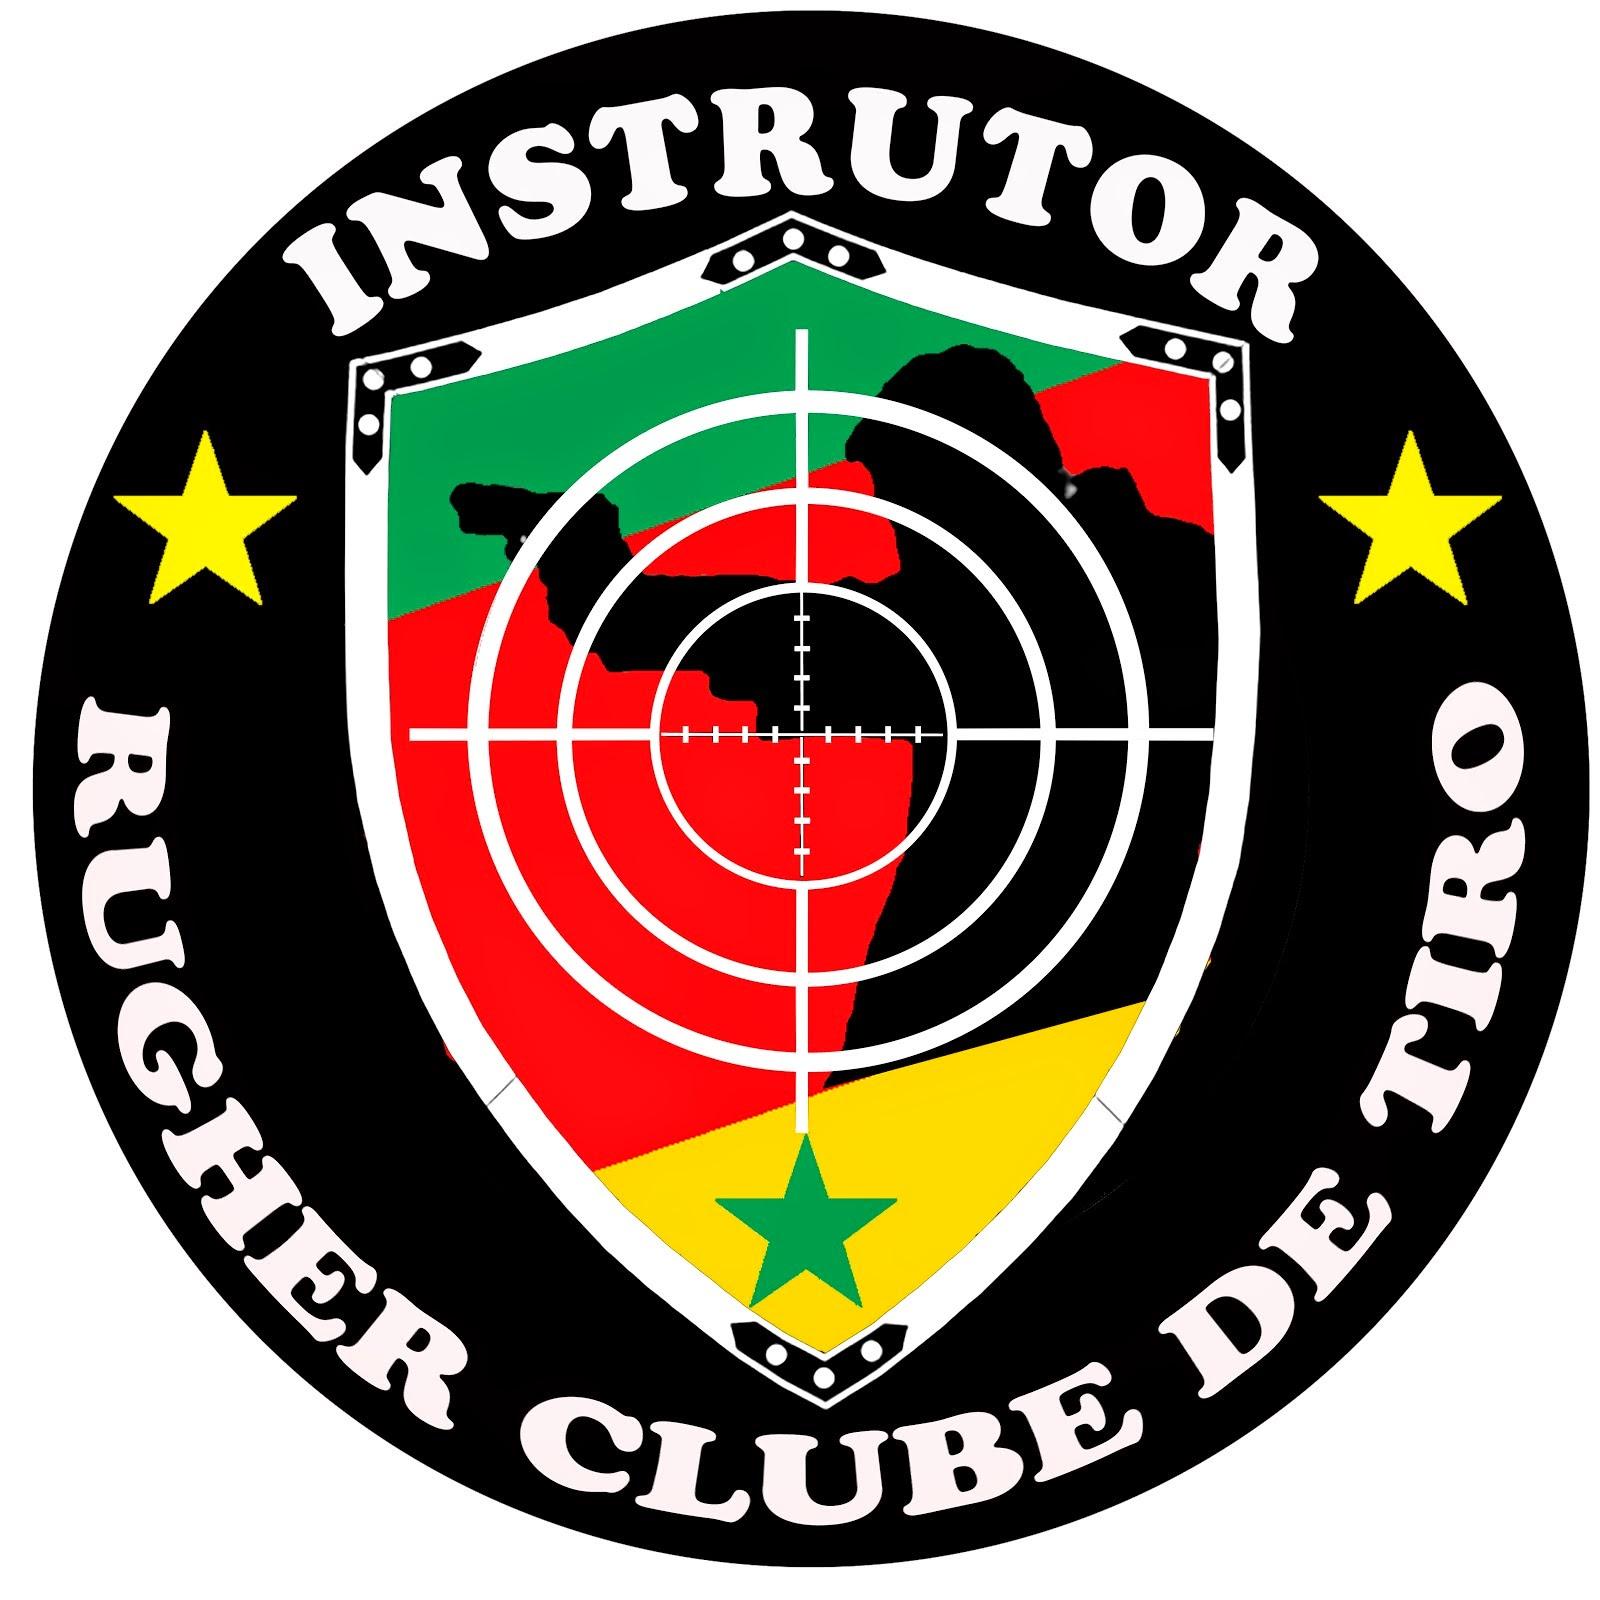 Instrutor Credenciado pela PF